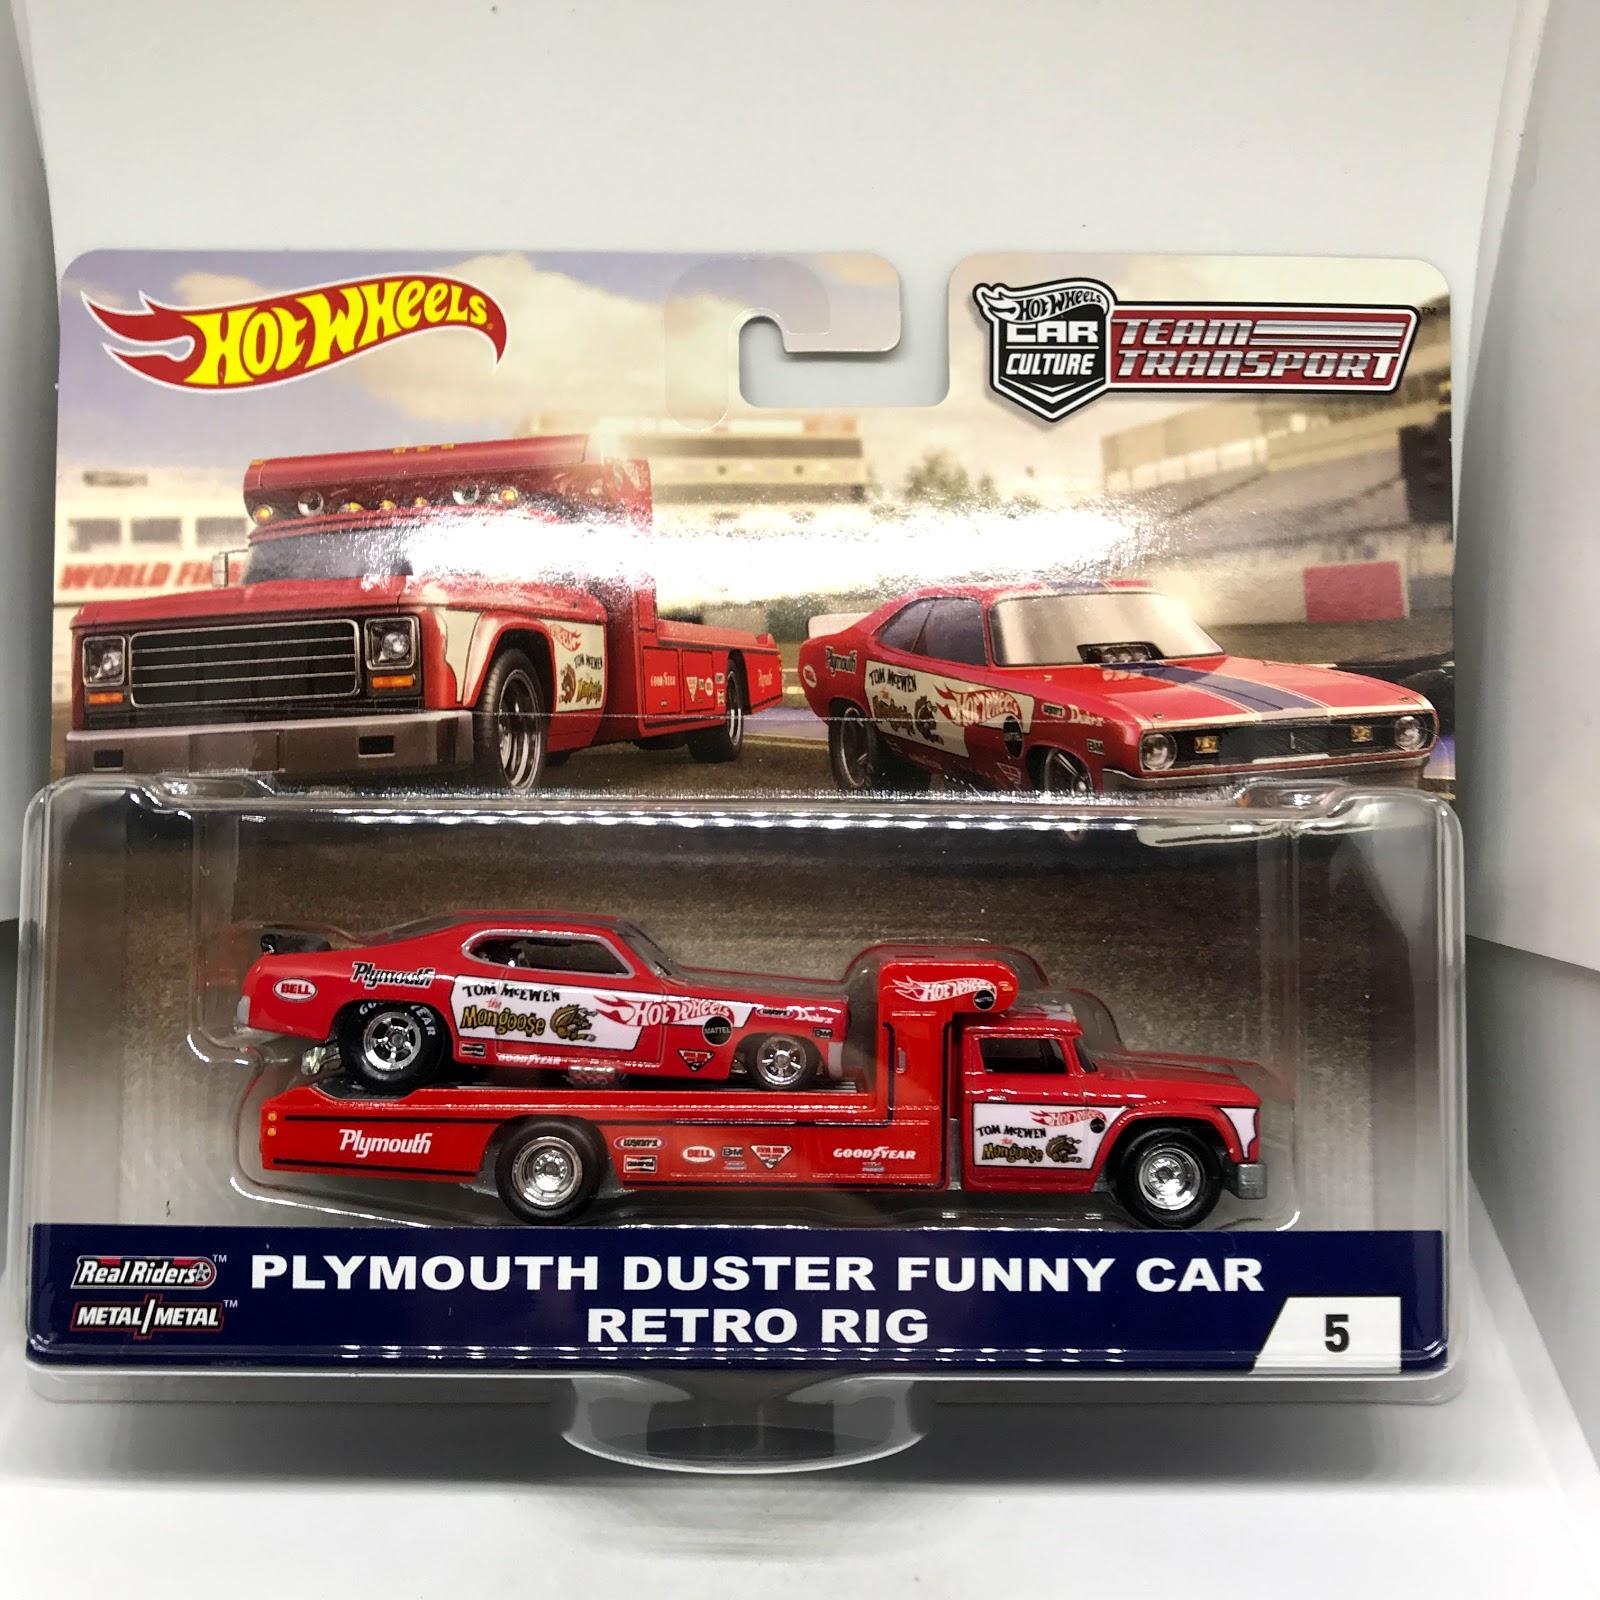 Hot Wheels Team Transport Plymouth Duster Funny Car Retro Rig  #5